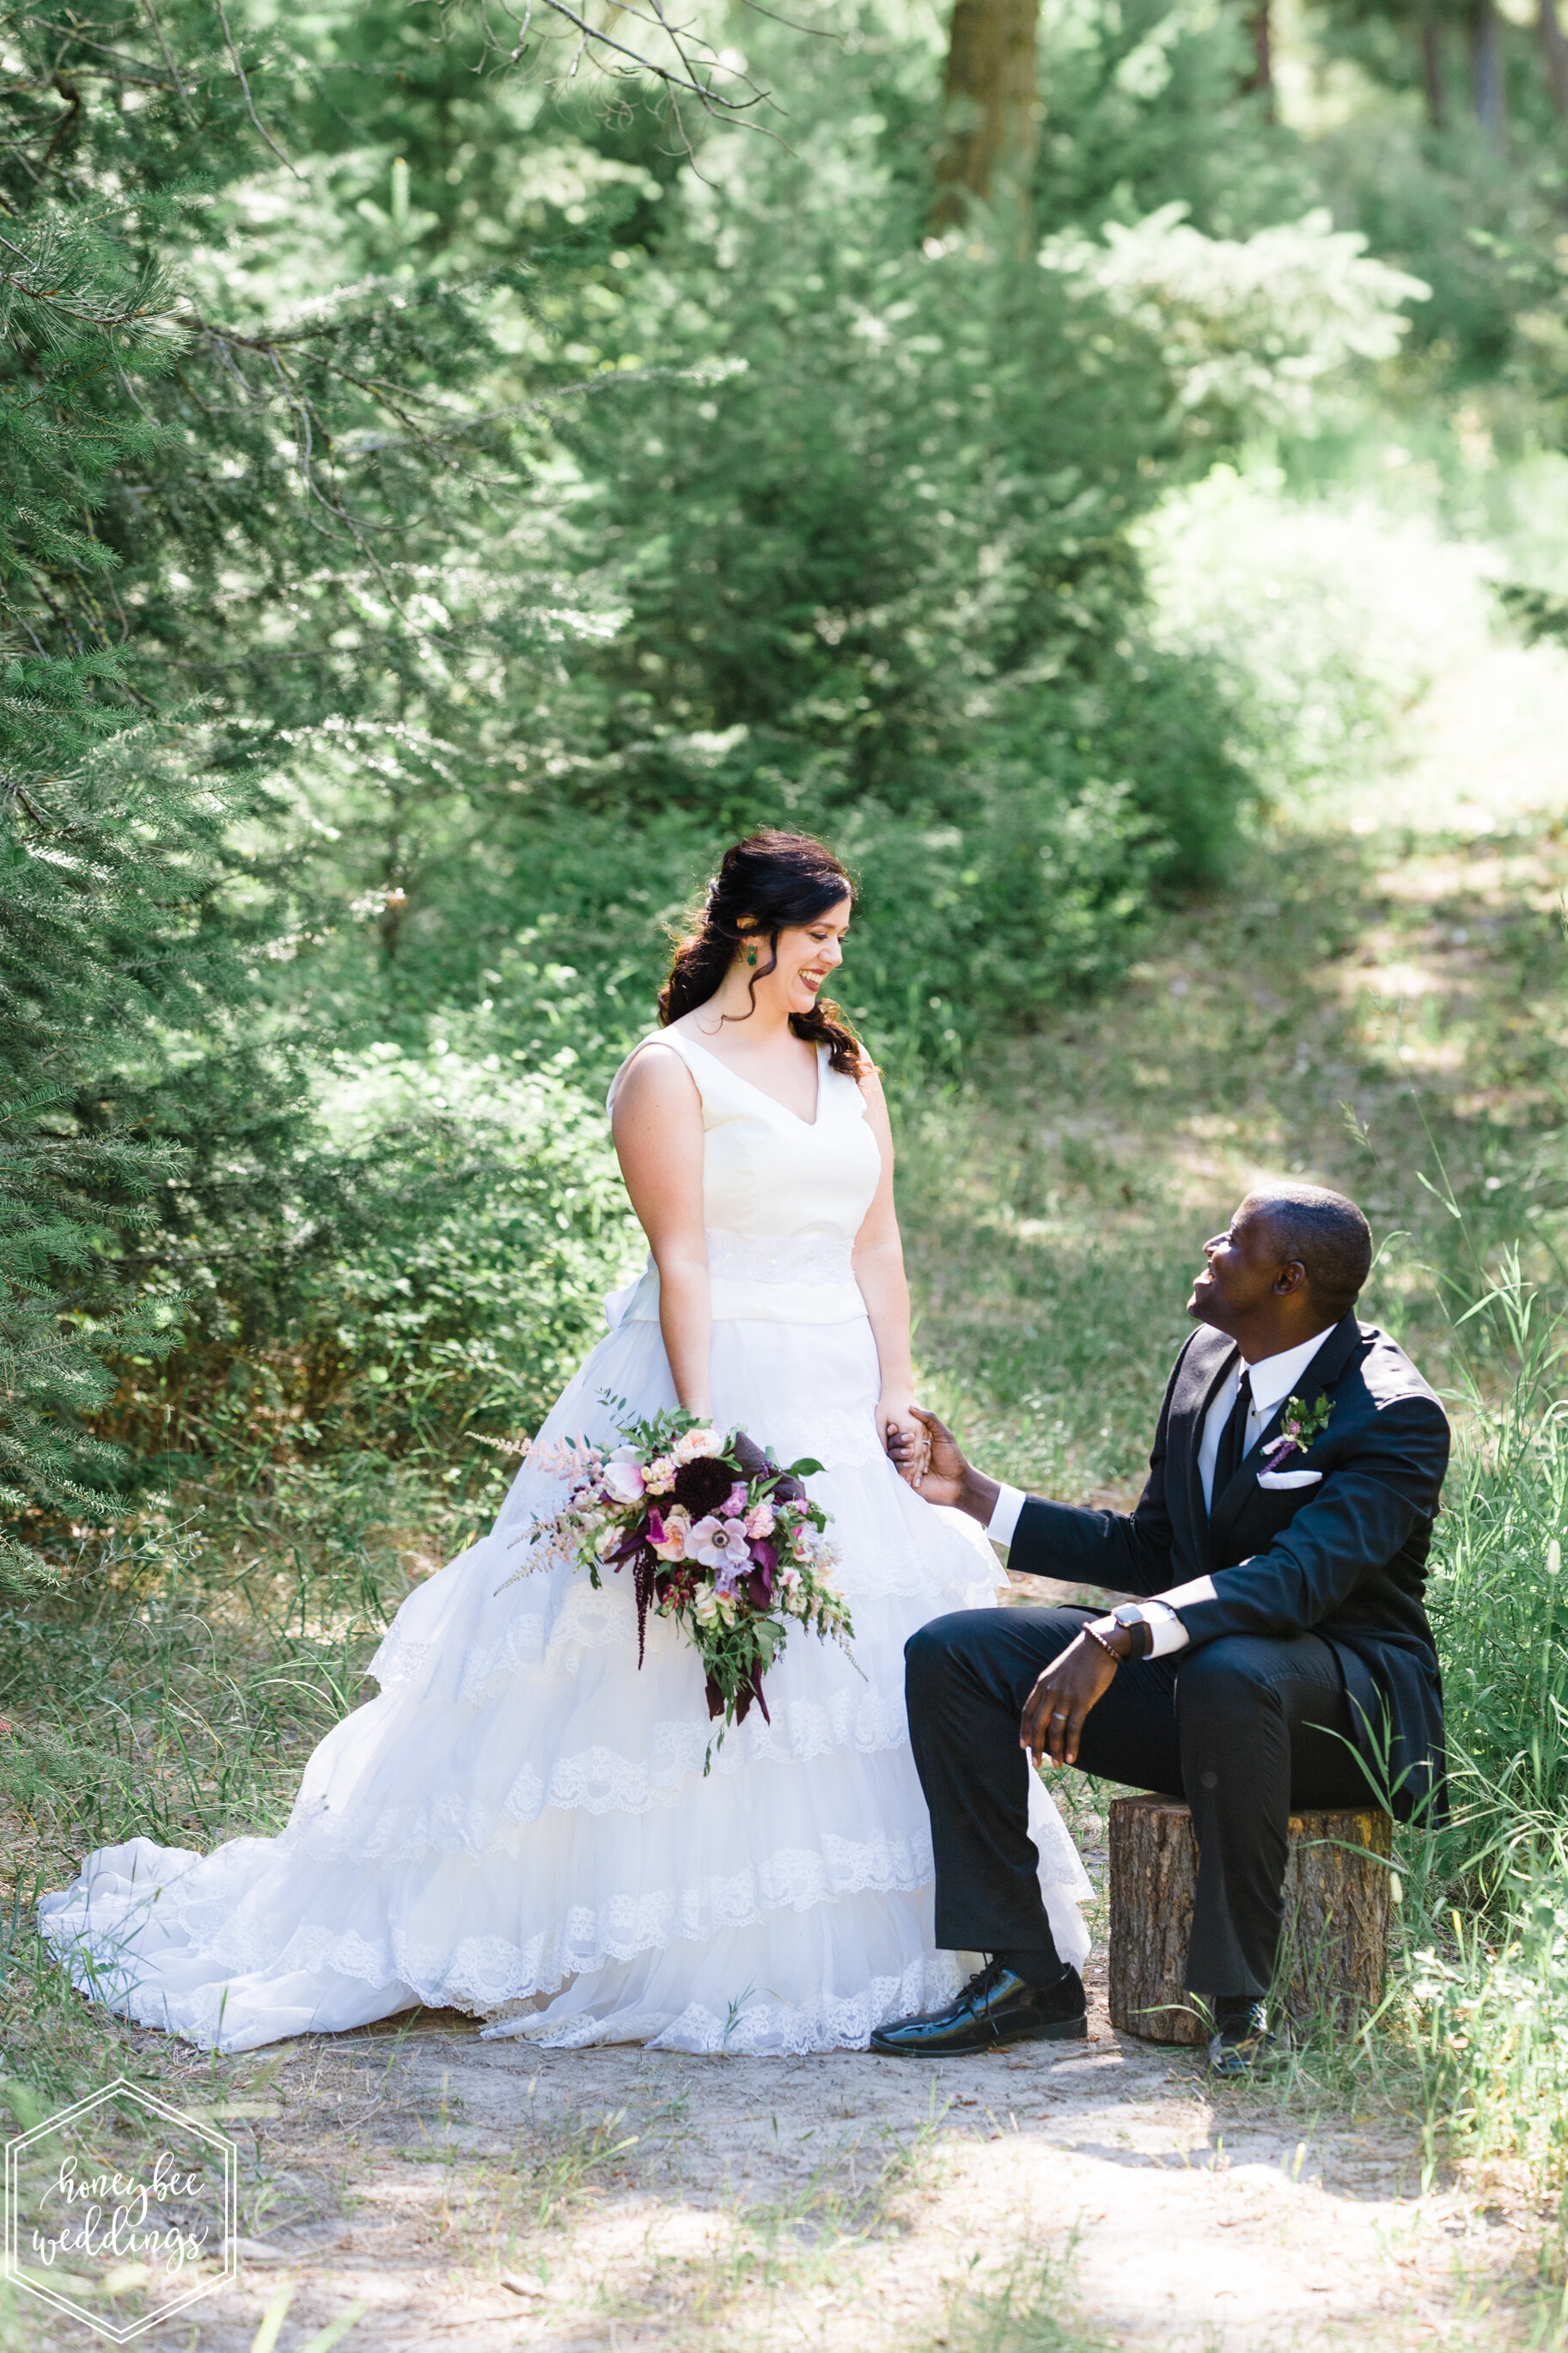 119White Raven Wedding_Montana Wedding Photographer_Rebekah & Likom_Honeybee Weddings_July 27, 2019-25.jpg